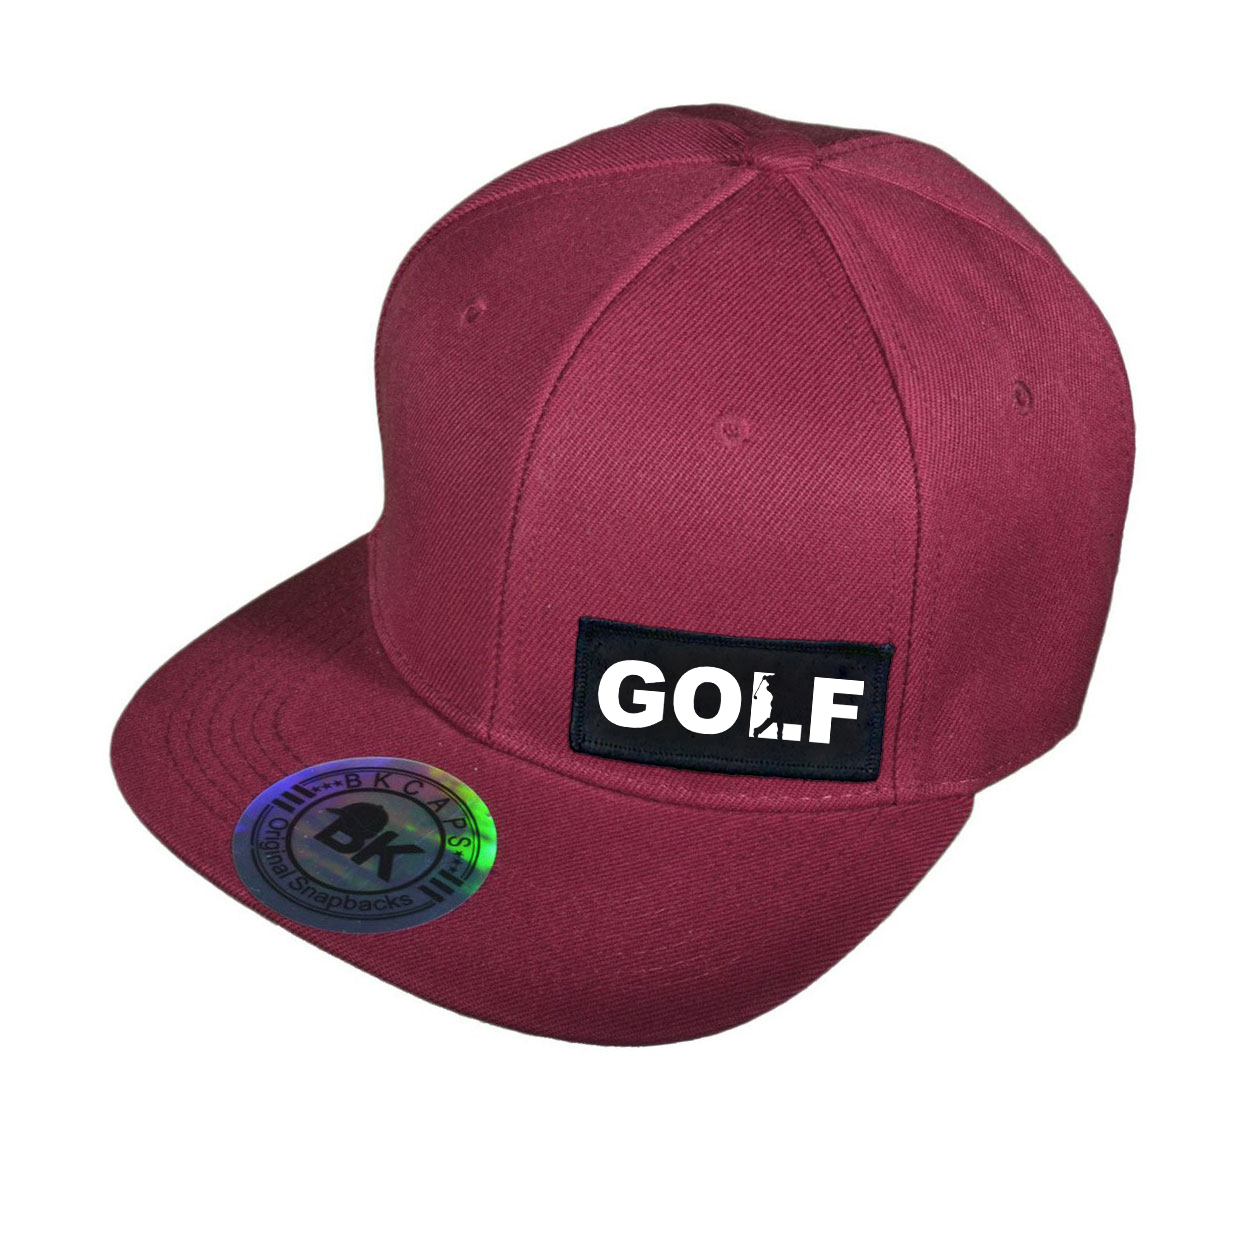 Golf Swing Logo Night Out Woven Patch Snapback Flat Brim Hat Burgundy (White Logo)